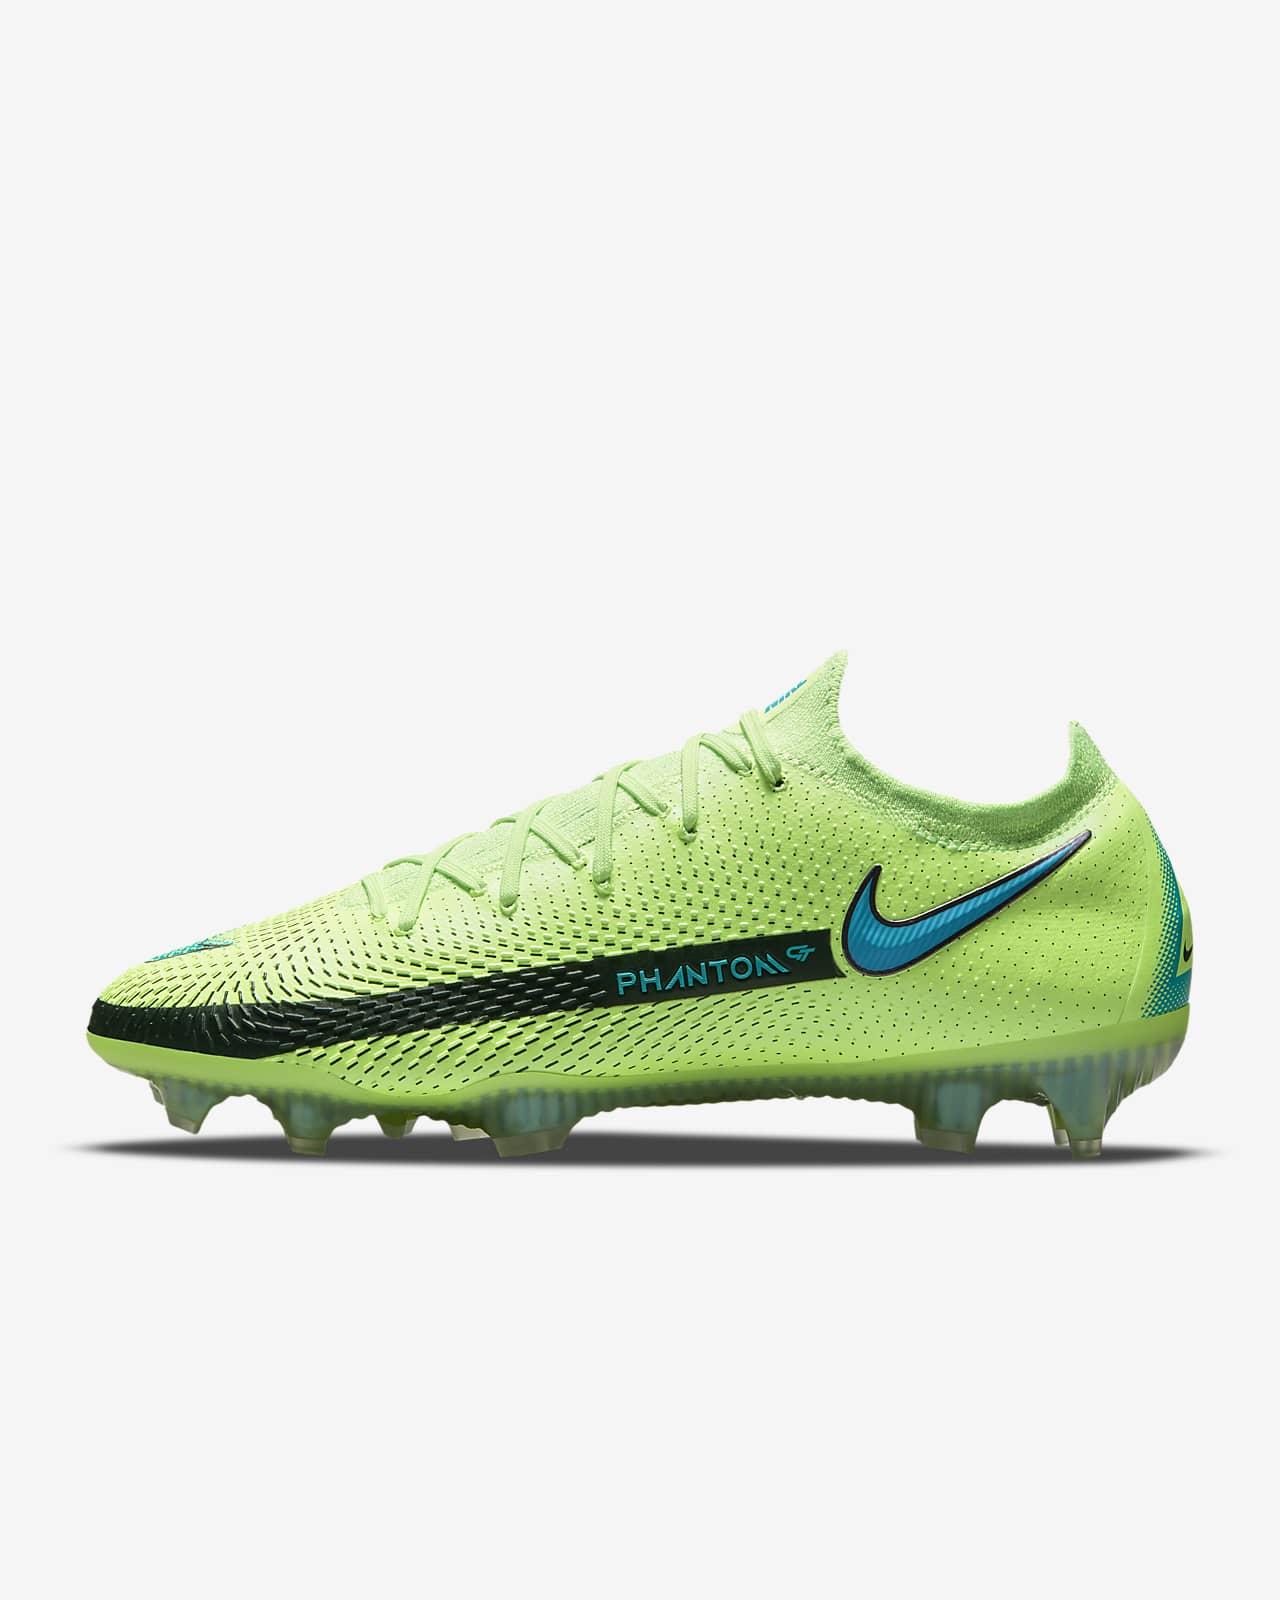 Chaussure de football à crampons pour terrain sec Nike Phantom GT Elite FG